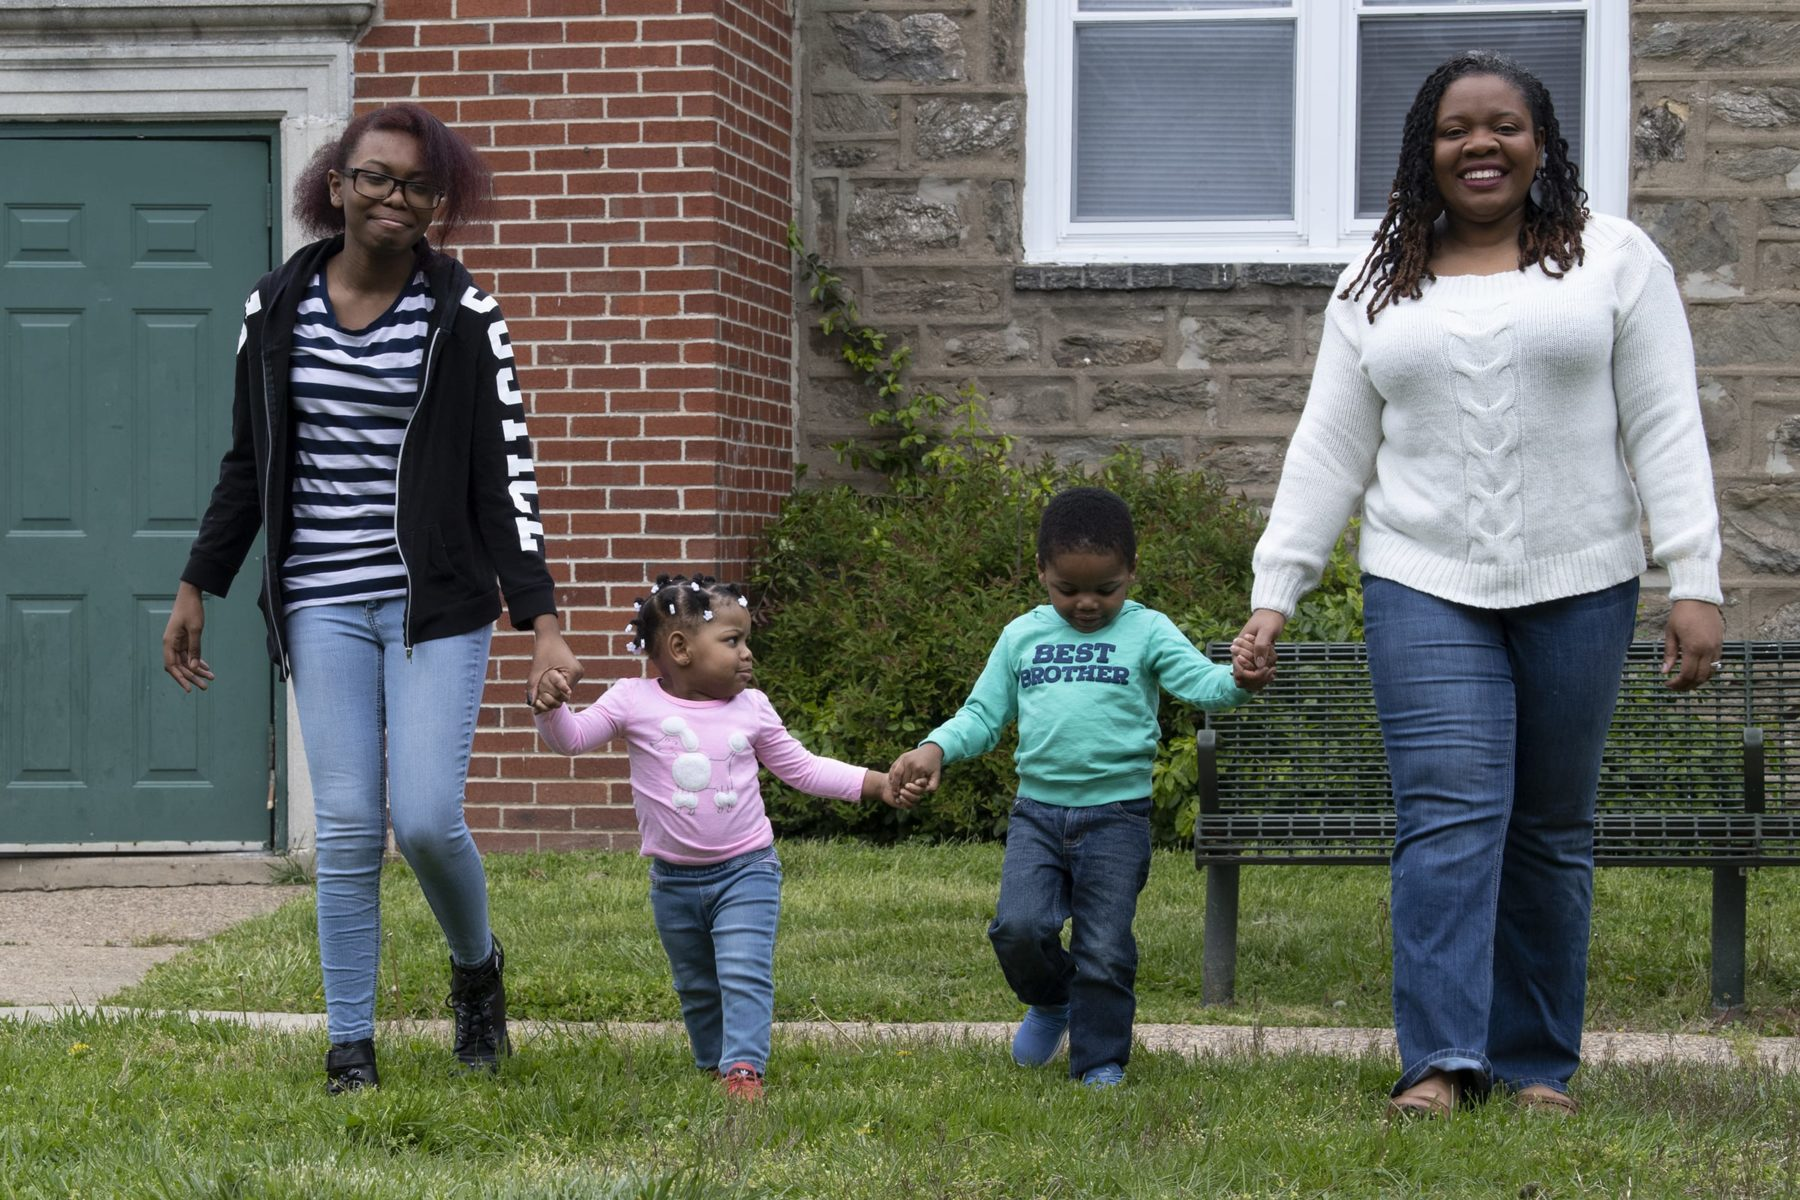 Kyana Hopkins-Thomas and her children